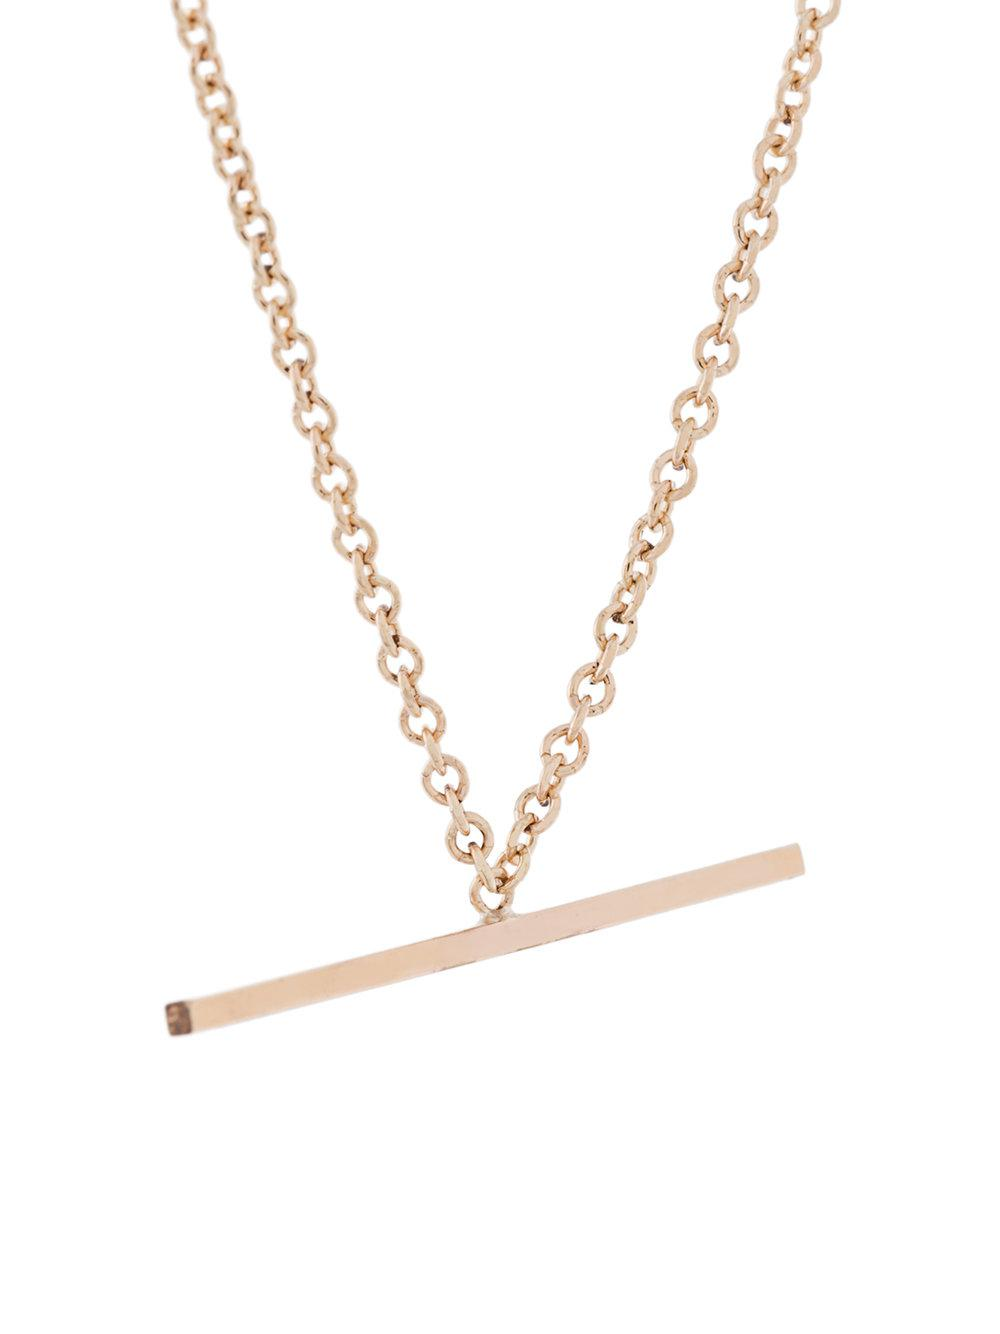 By Boe Mini Bar Necklace in Metallic